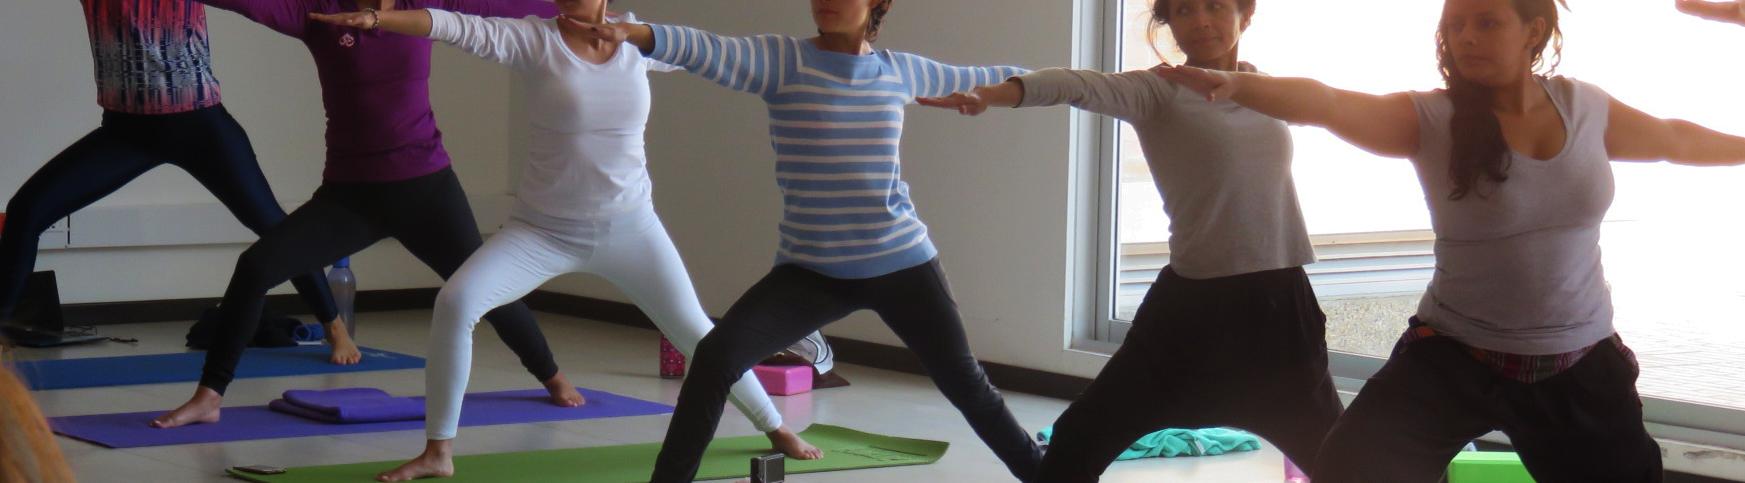 clases-de-yoga-bogota-0